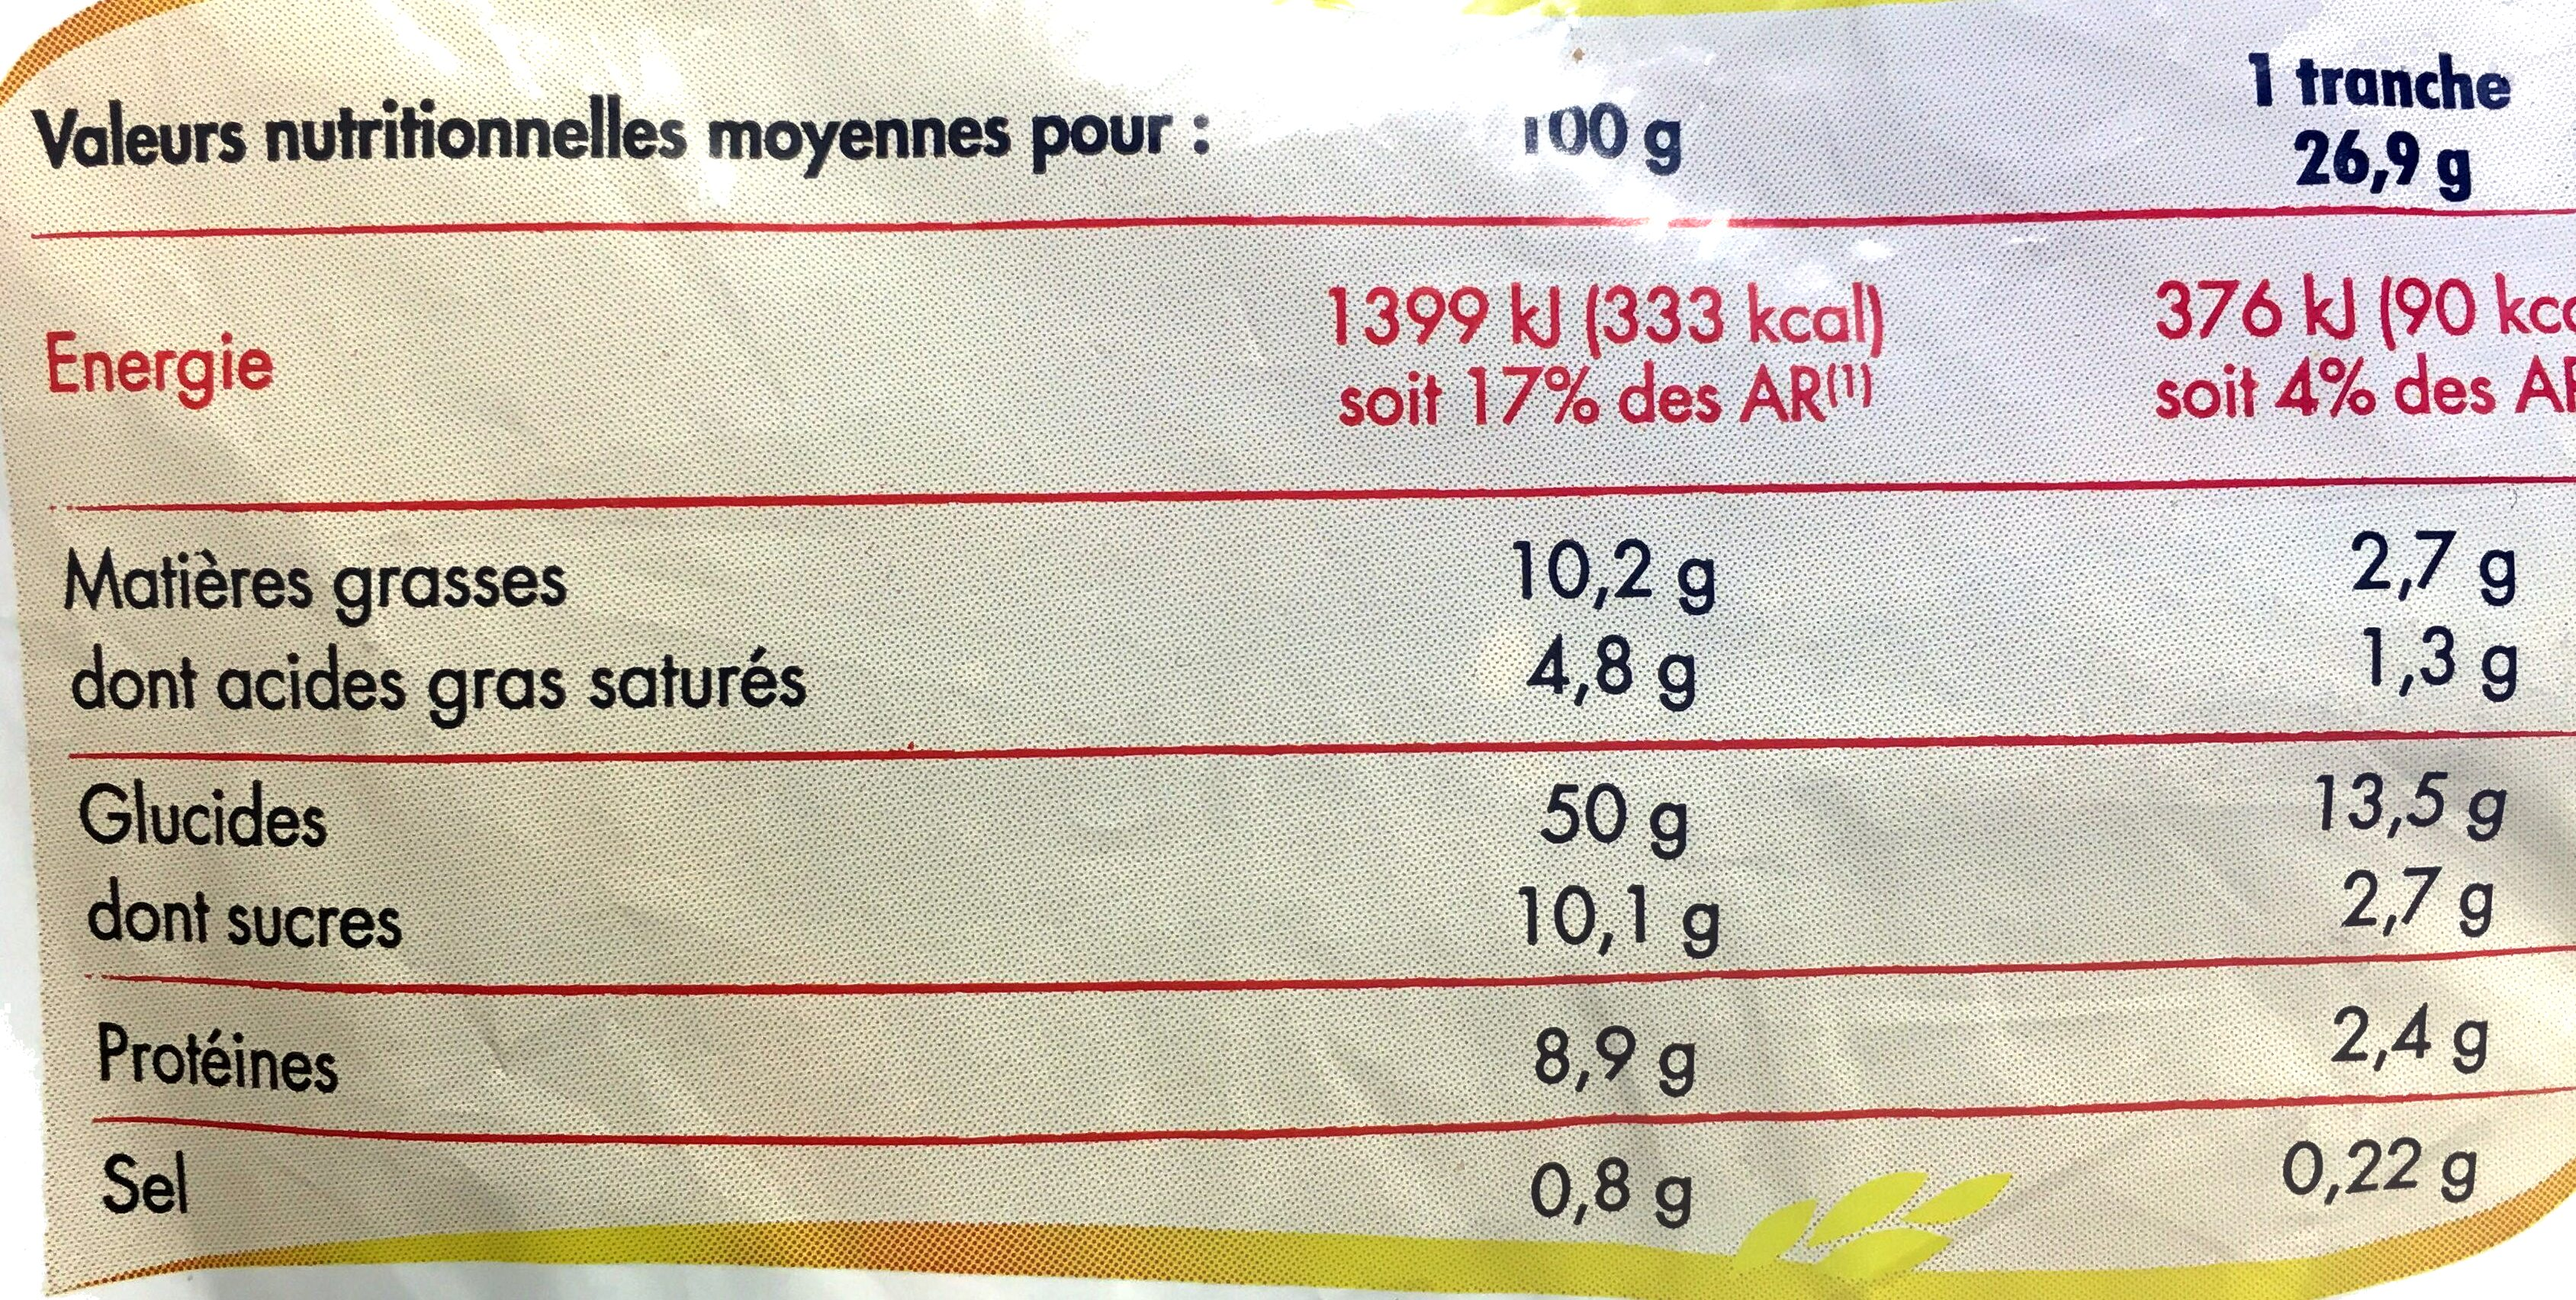 Brioche tranchée - Nutrition facts